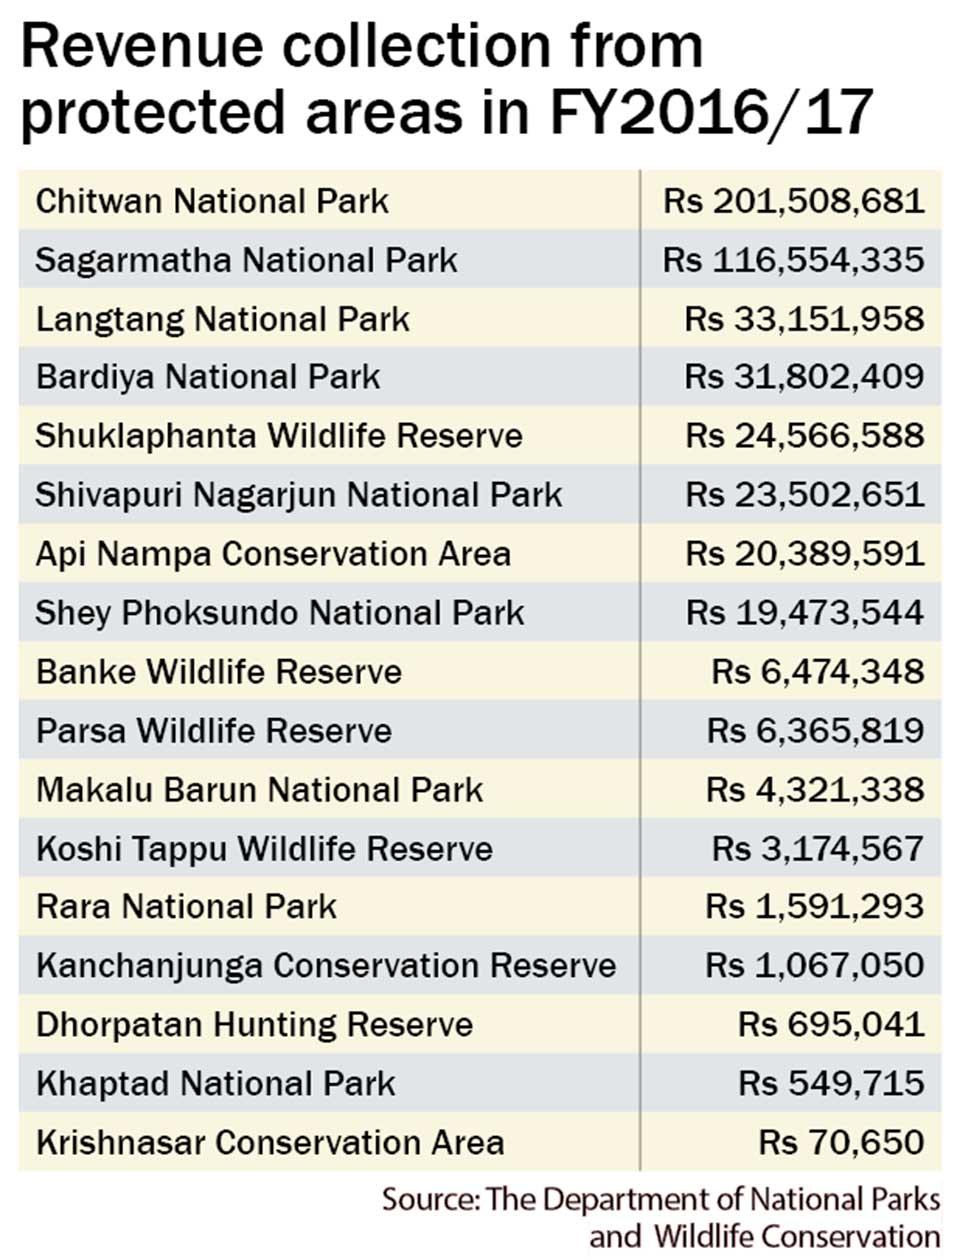 Protected areas report 58 percent surge in revenue